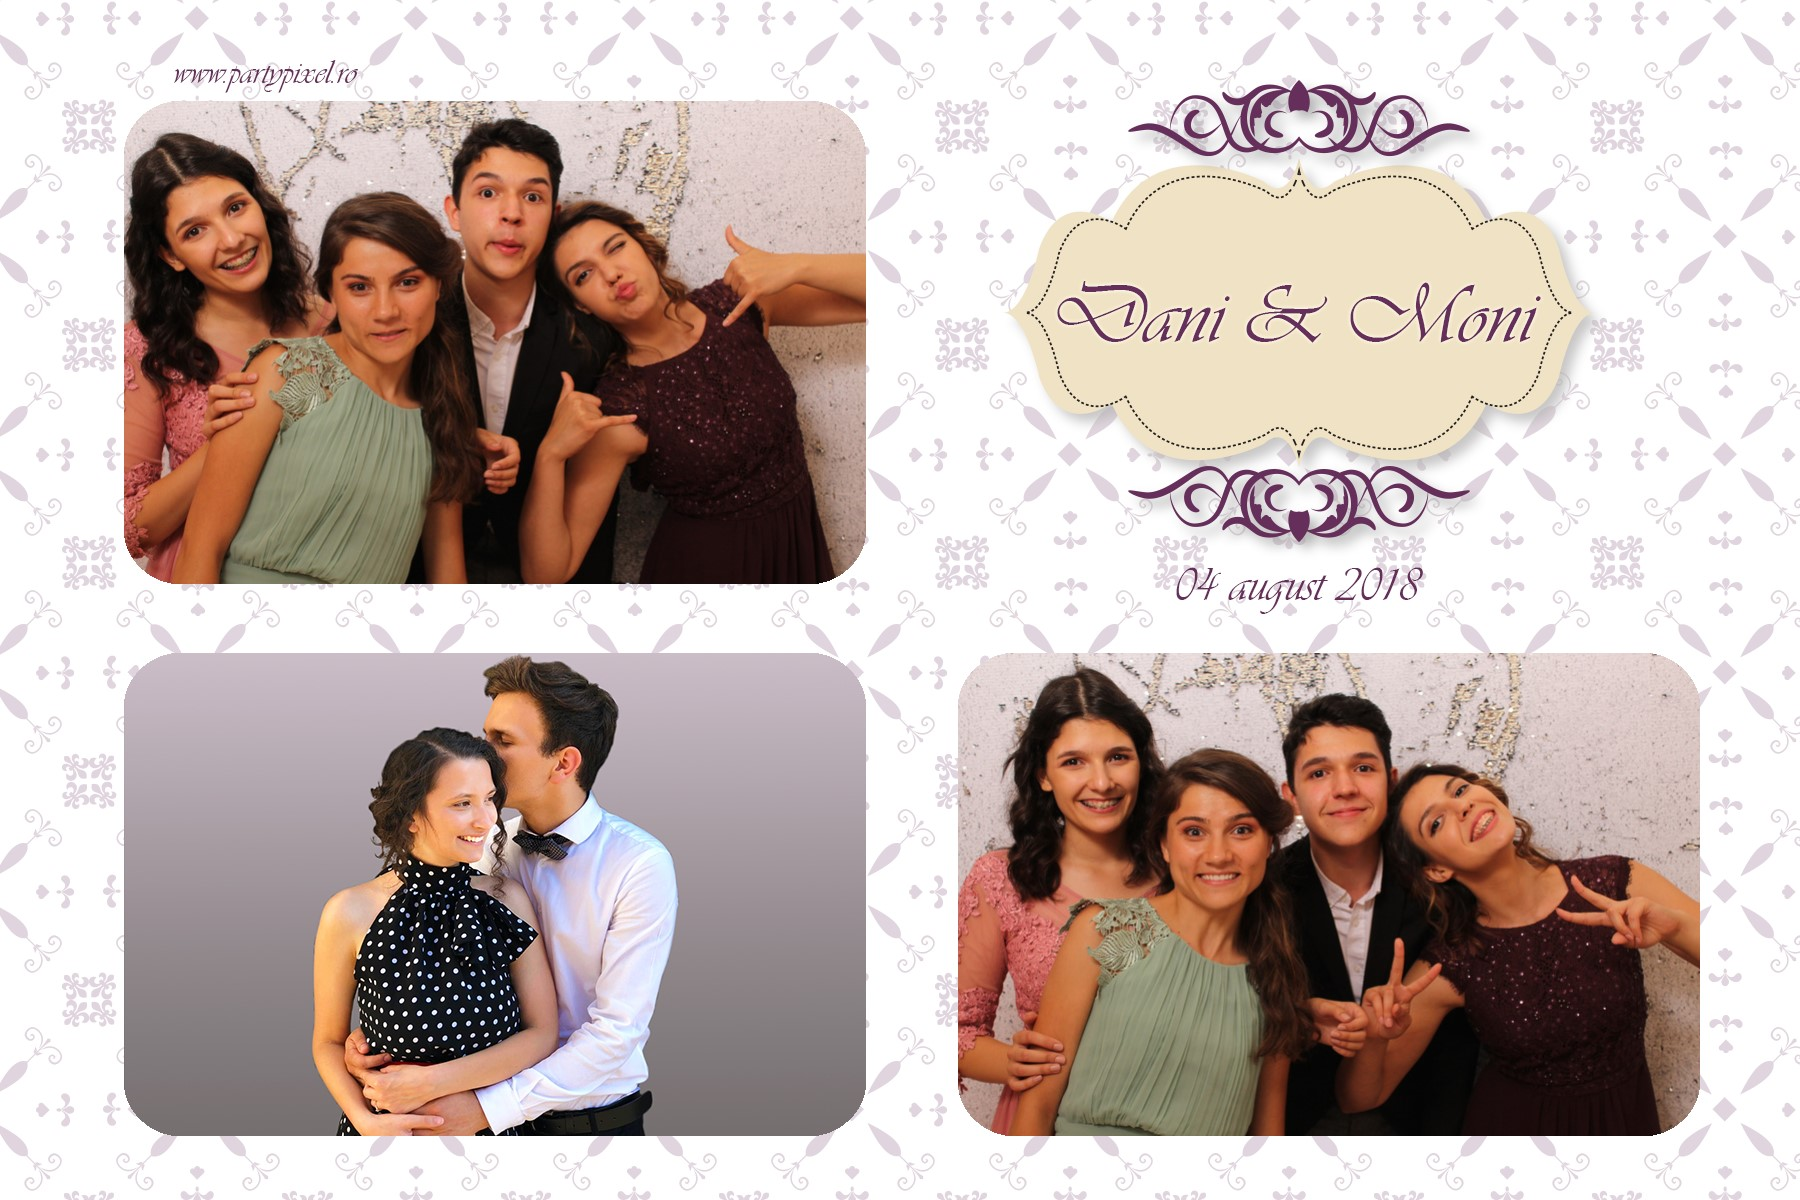 Cabina foto nunta Dani si Moni